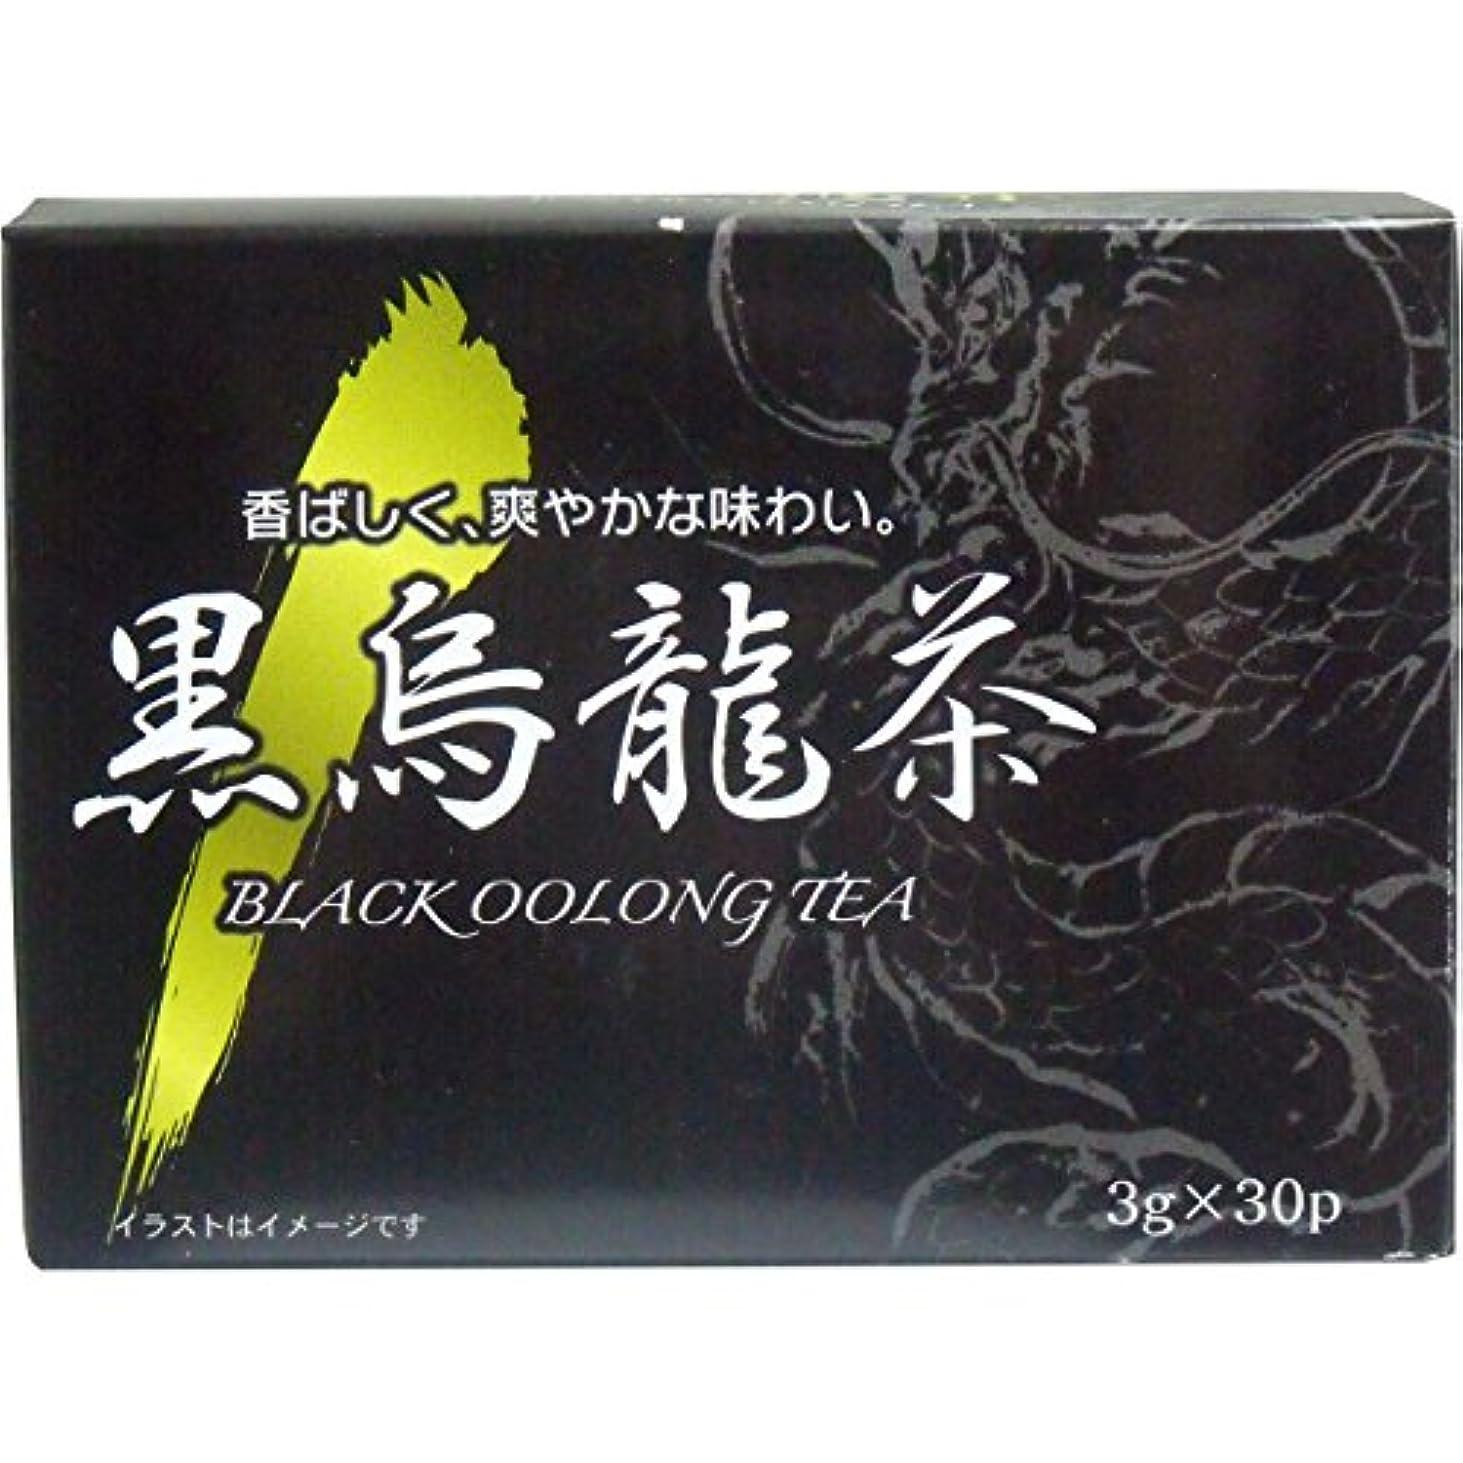 伝記値技術的な黒烏龍茶 3g*30袋入